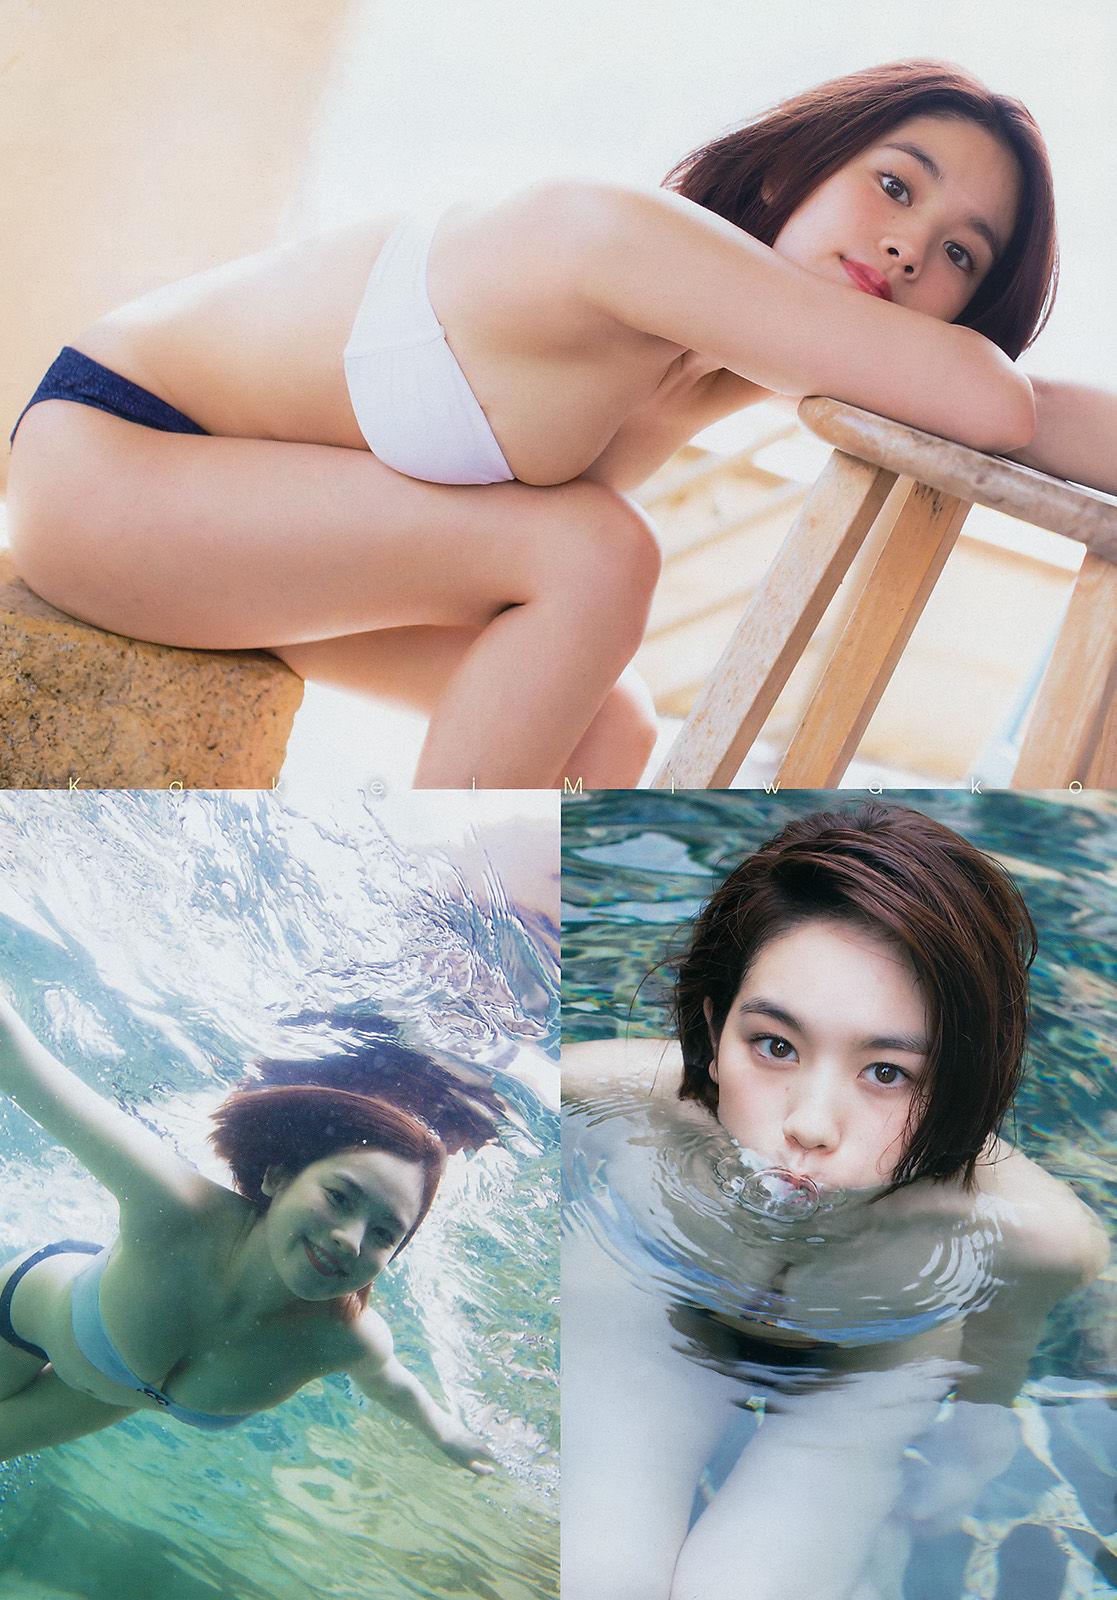 VOL.392 [Young Magazine]日本嫩模:笕美和子超高清写真套图(11P)